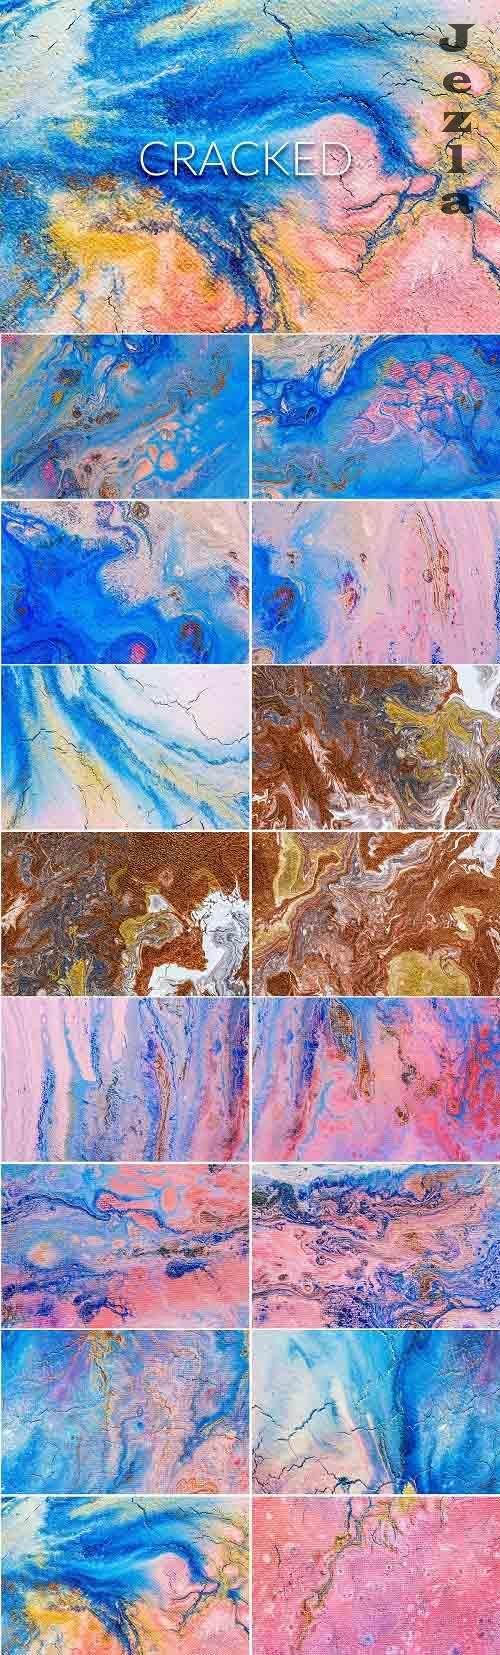 Liquid Paint - Cracked Vol. 3 - 4681391